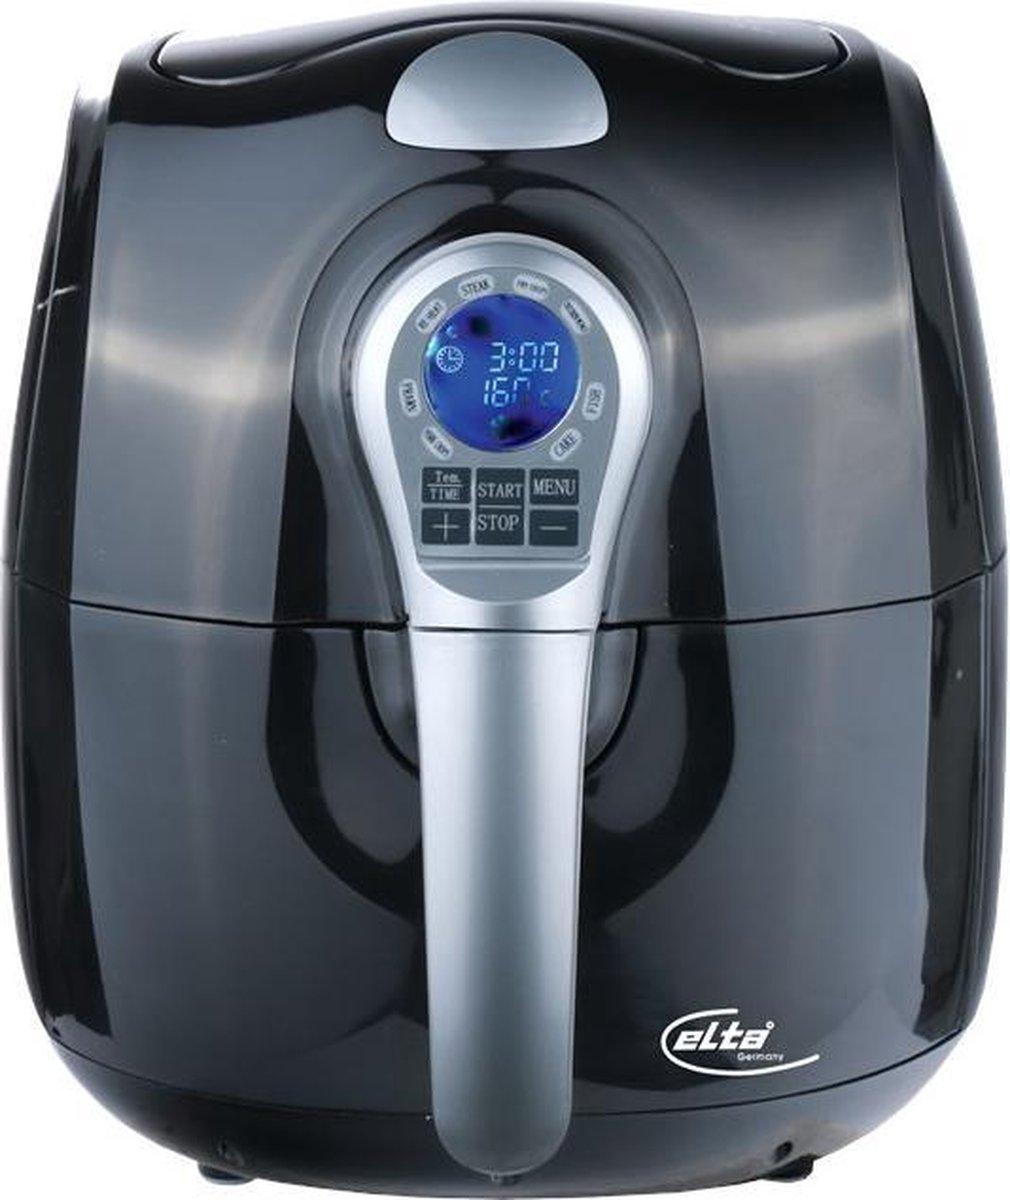 Elta Air Fryer hete lucht friteuse 3L